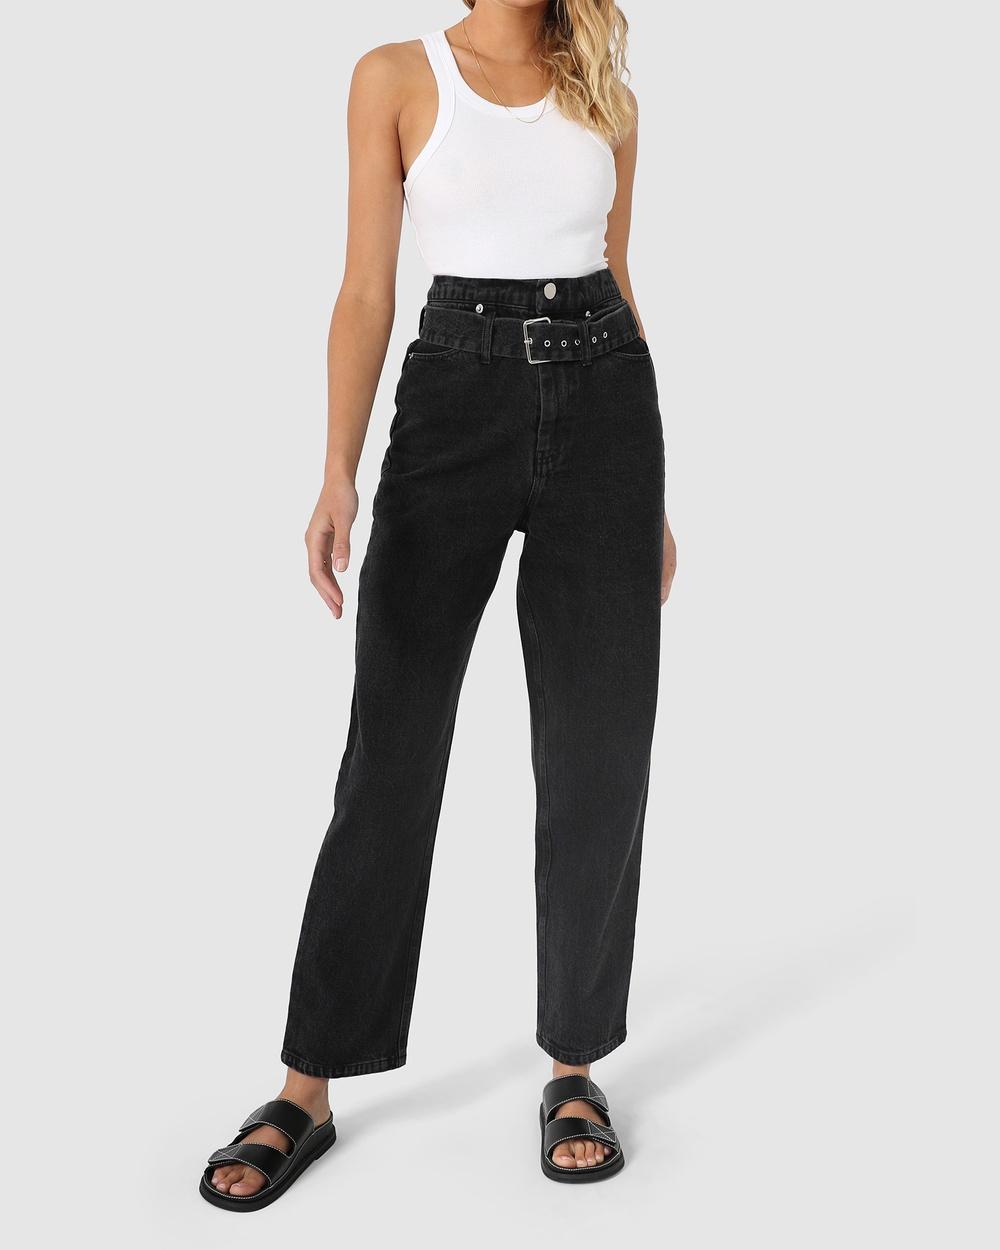 Madison The Label Olympus Jeans High-Waisted Washed Black Denim Australia